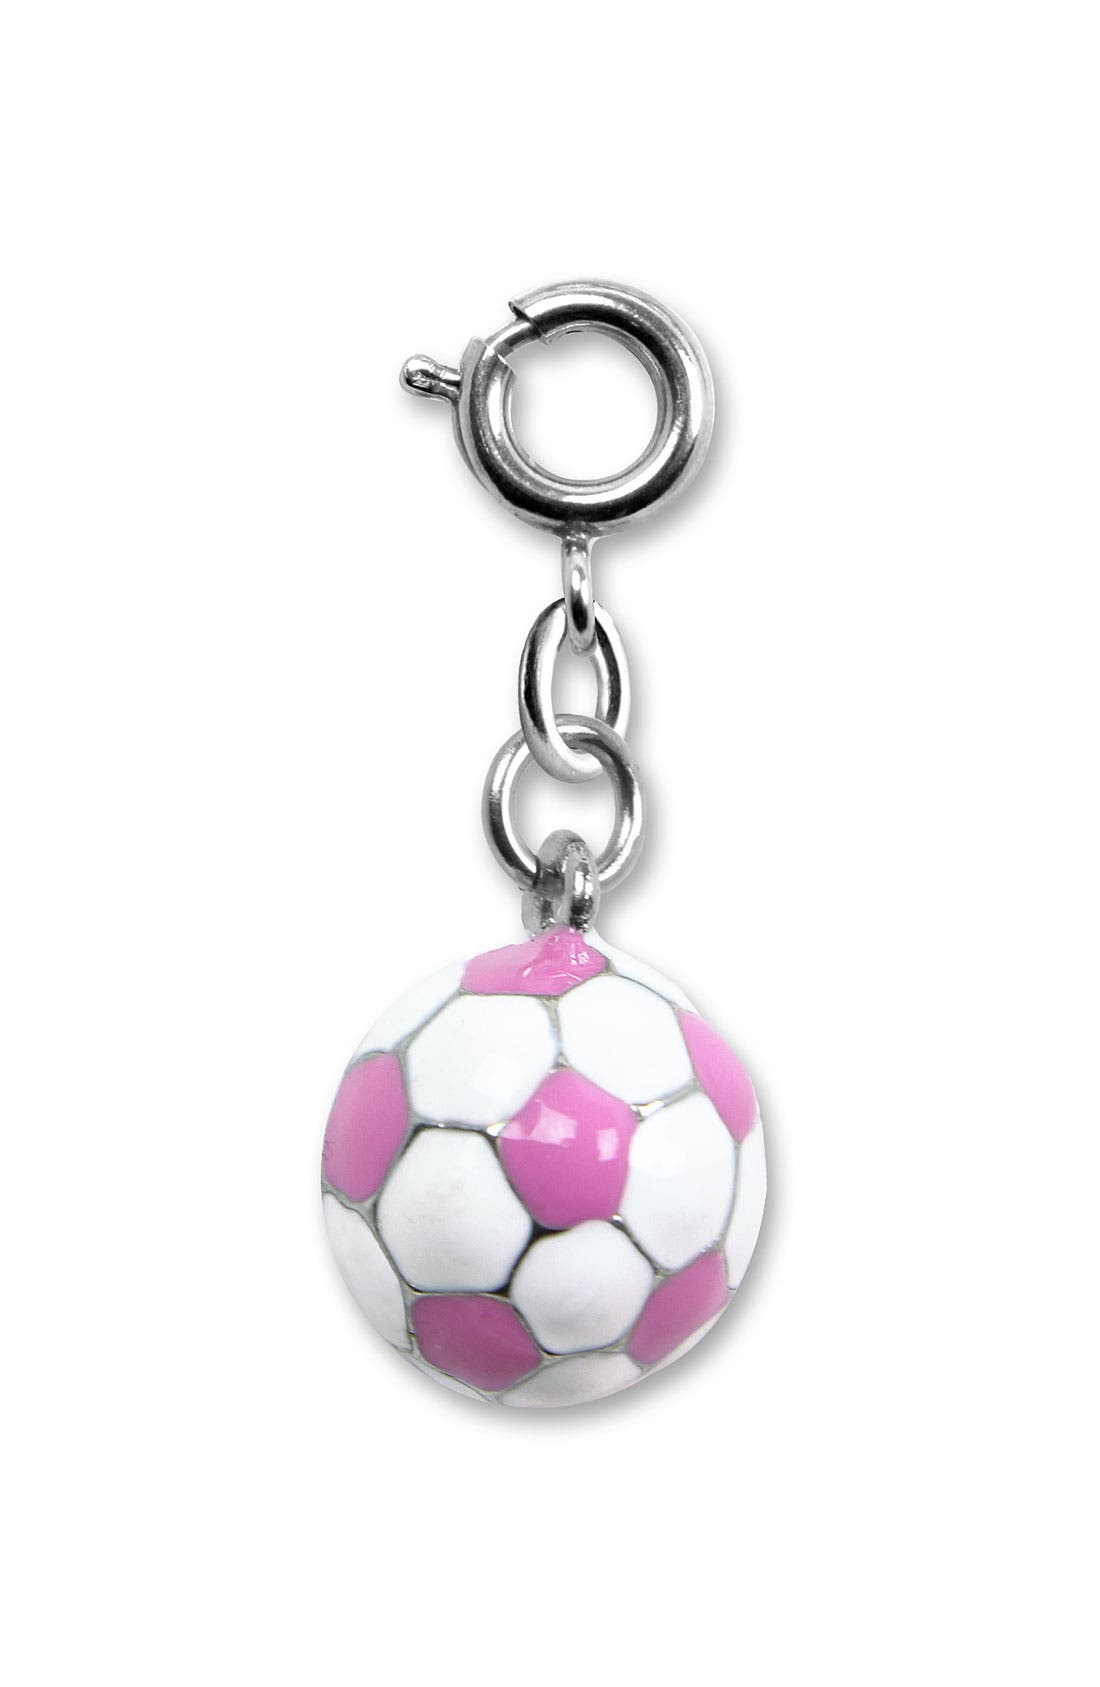 Alternate Image 1 Selected - CHARM IT!® 'Soccer Ball' Charm (Girls)